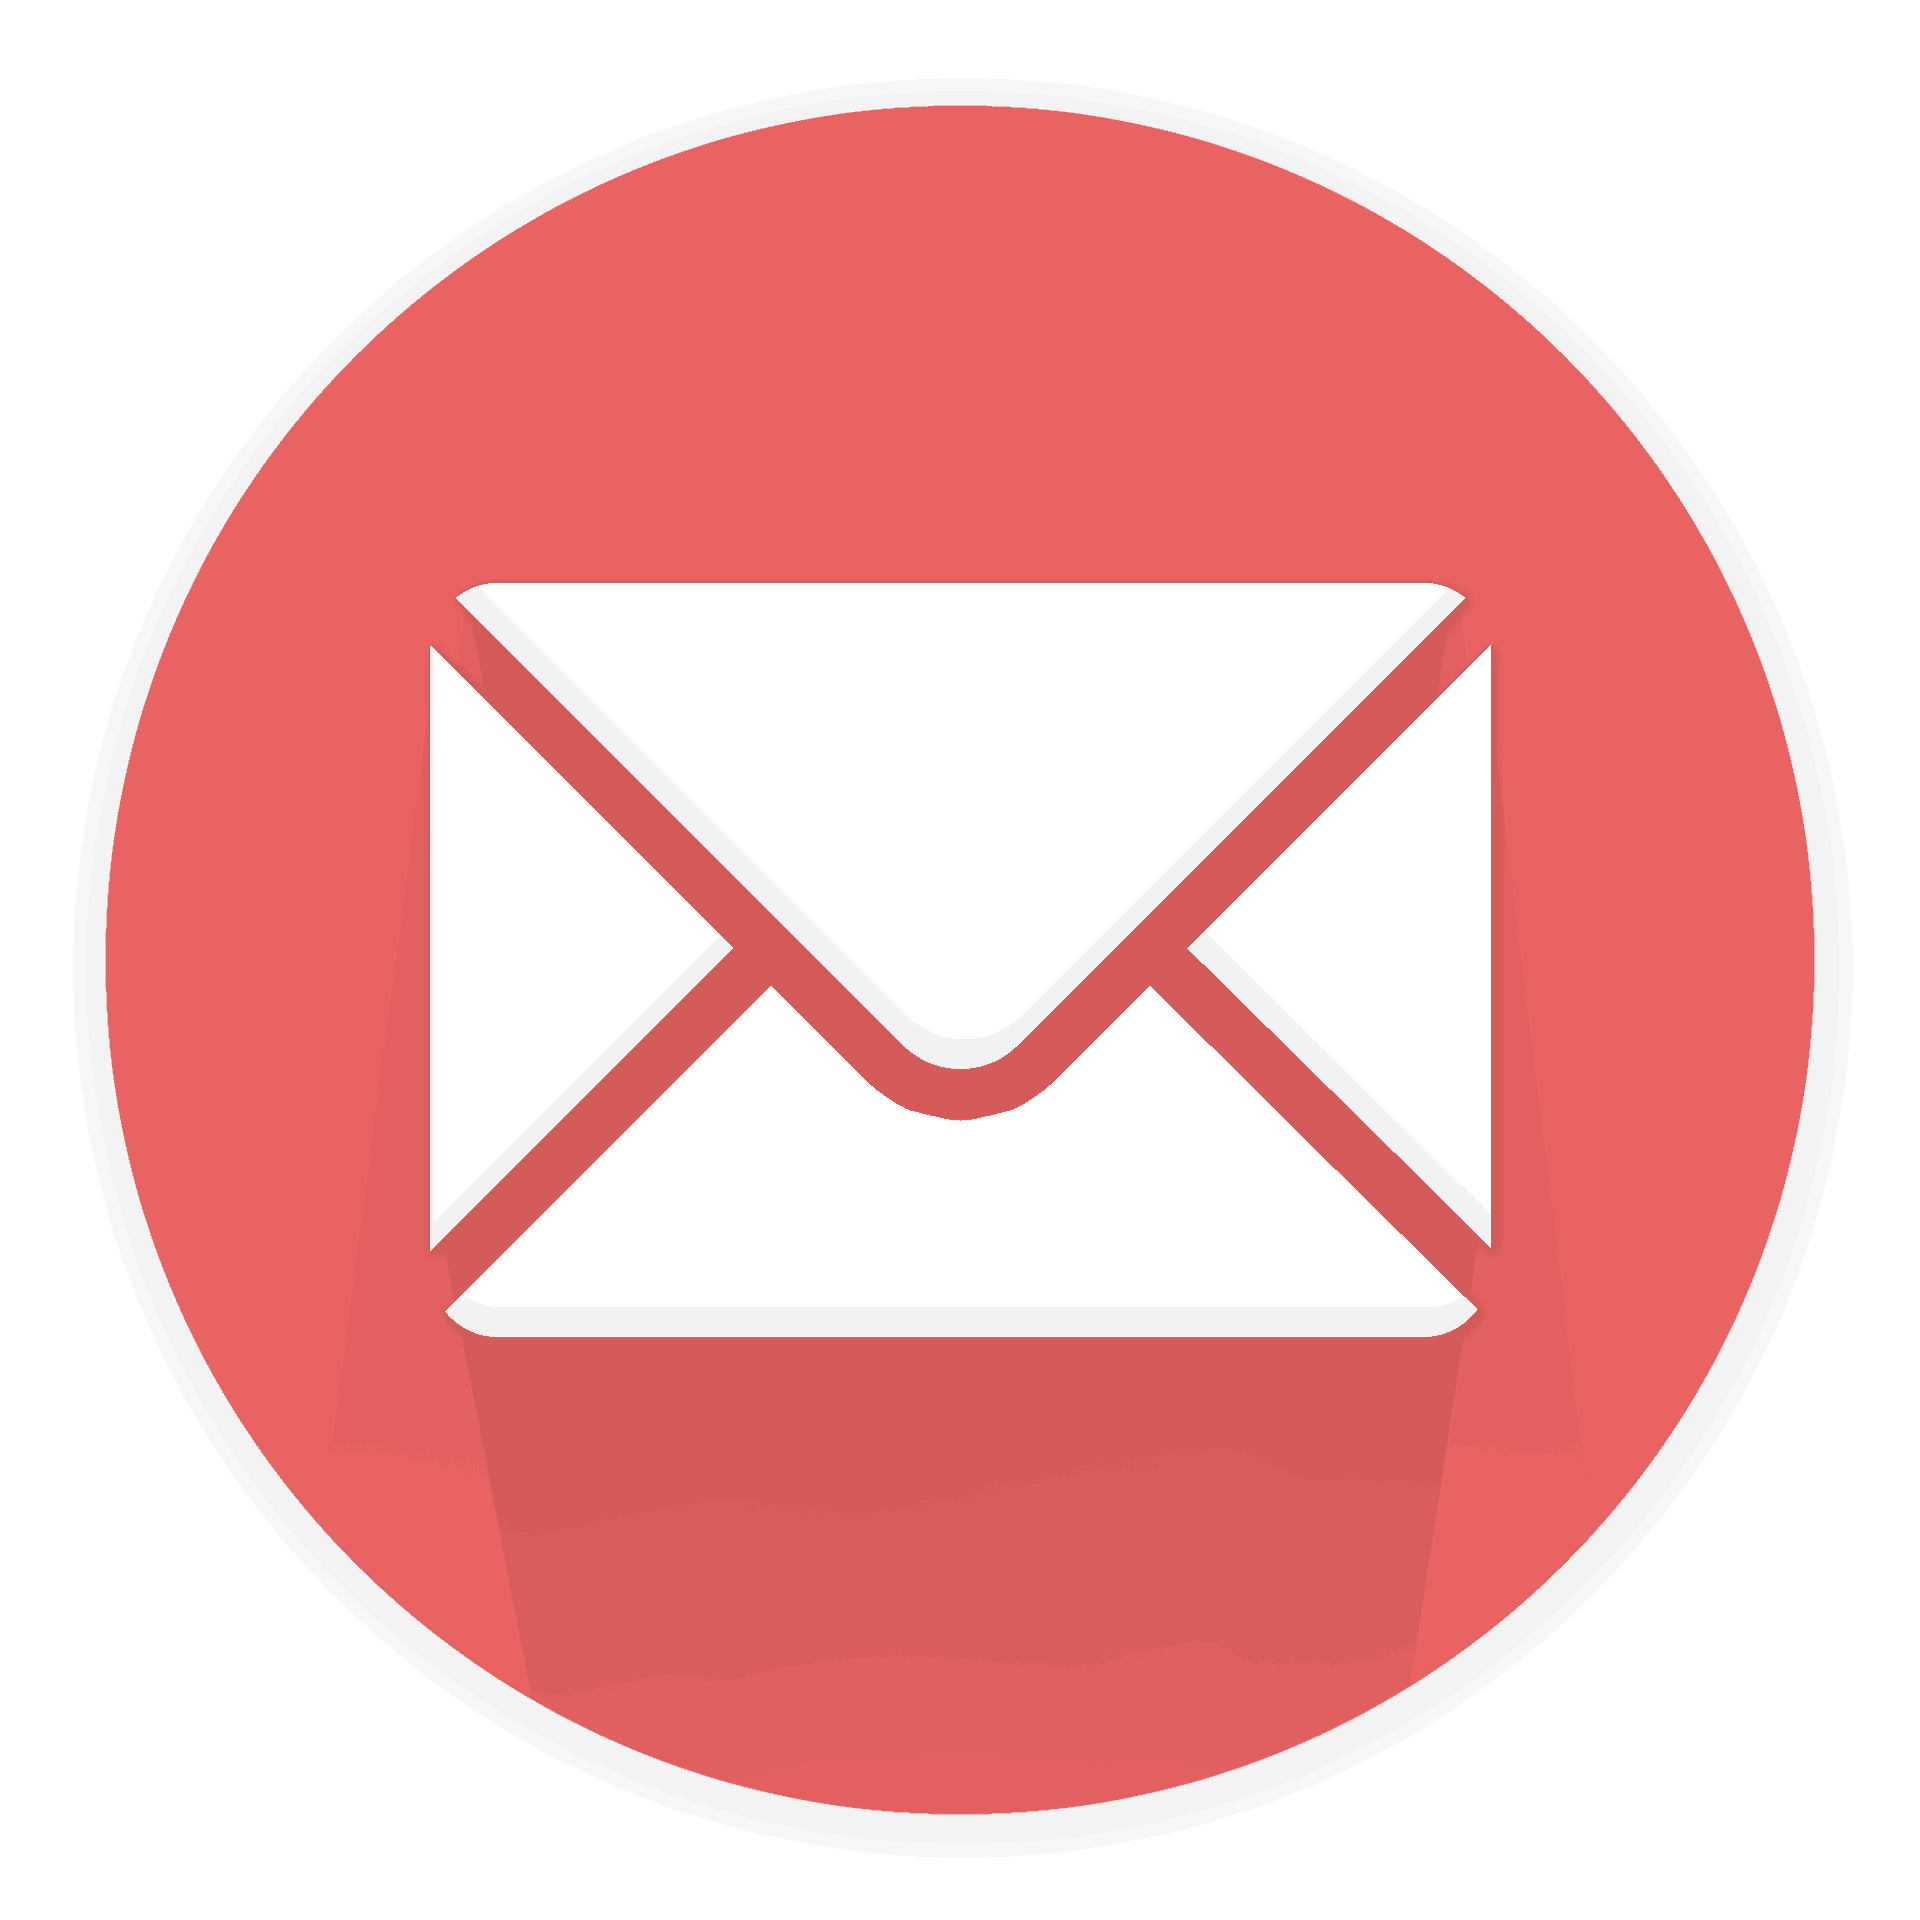 Briefumschlag E-Mail Icon